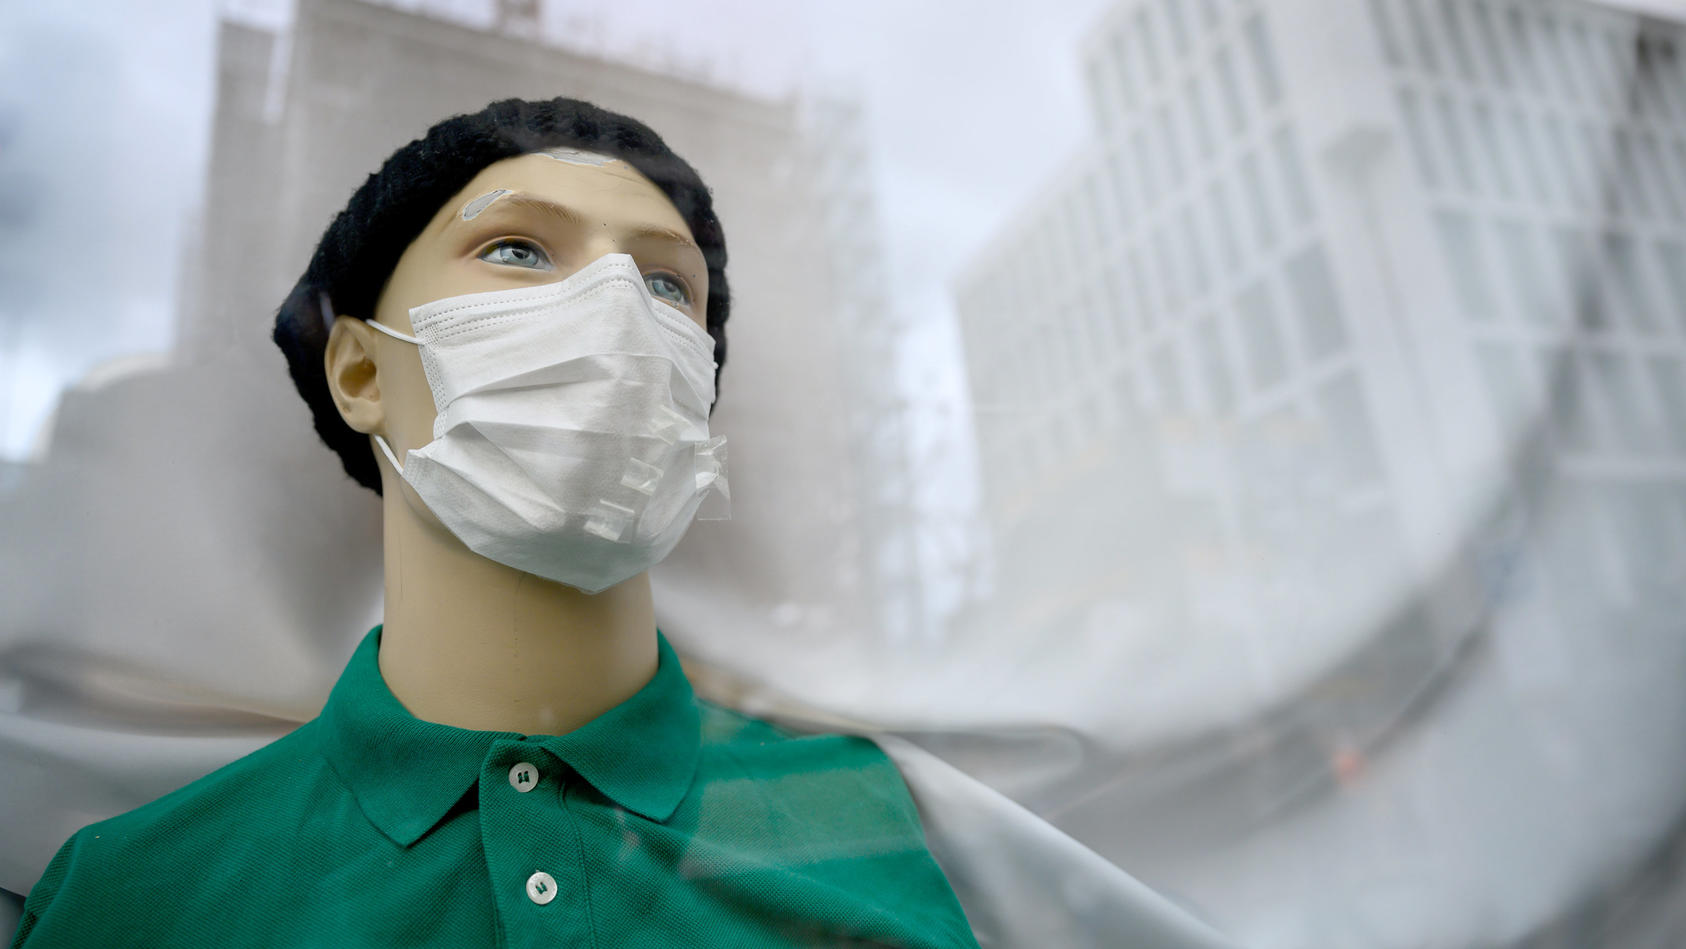 Mit Atmungs-Puppen Virenlast gemessen